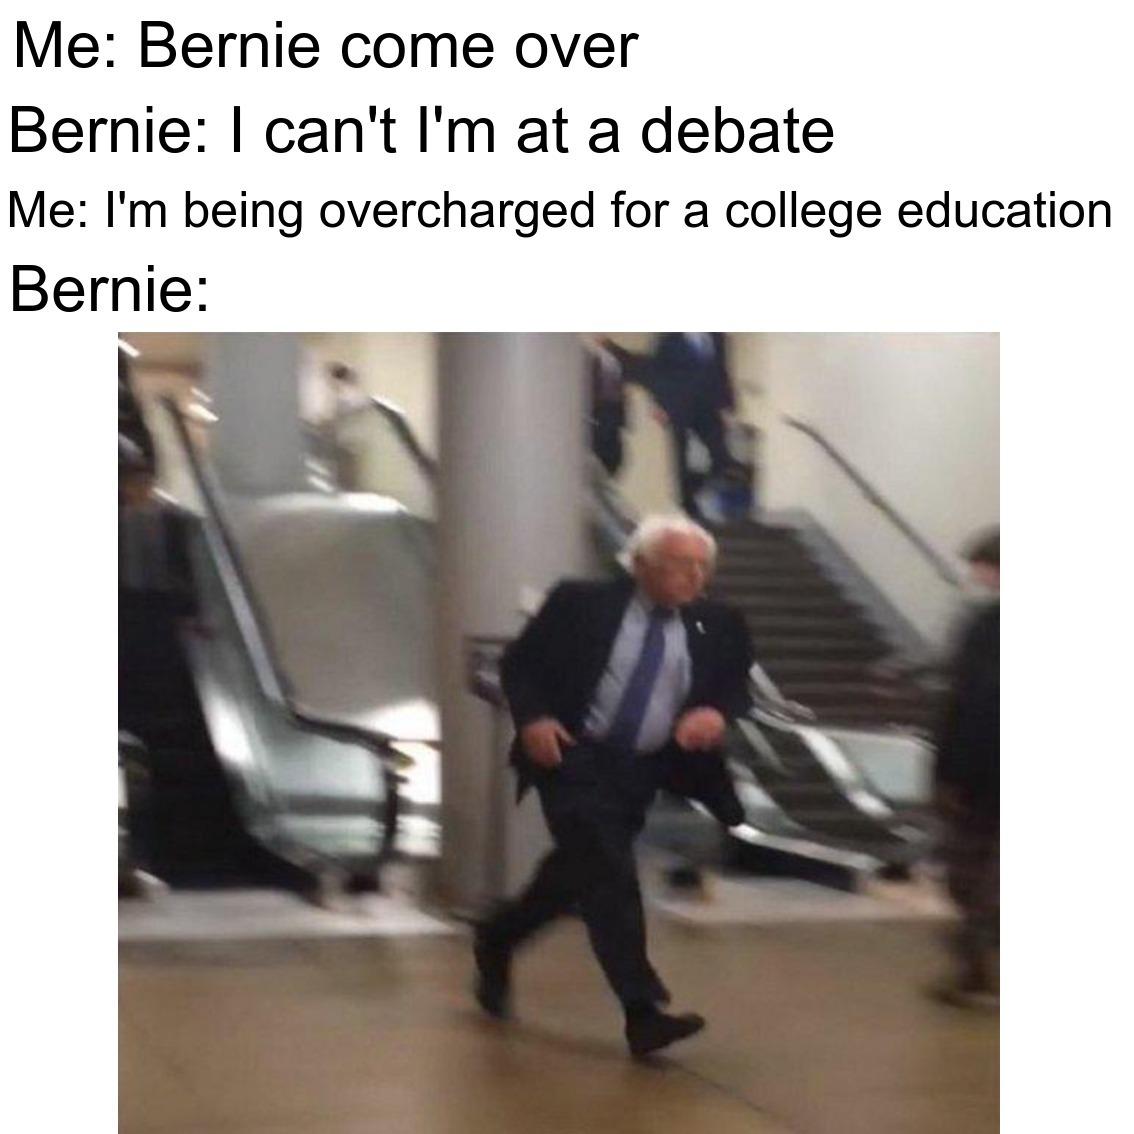 my overpriced college education brings bernie to the yard - meme